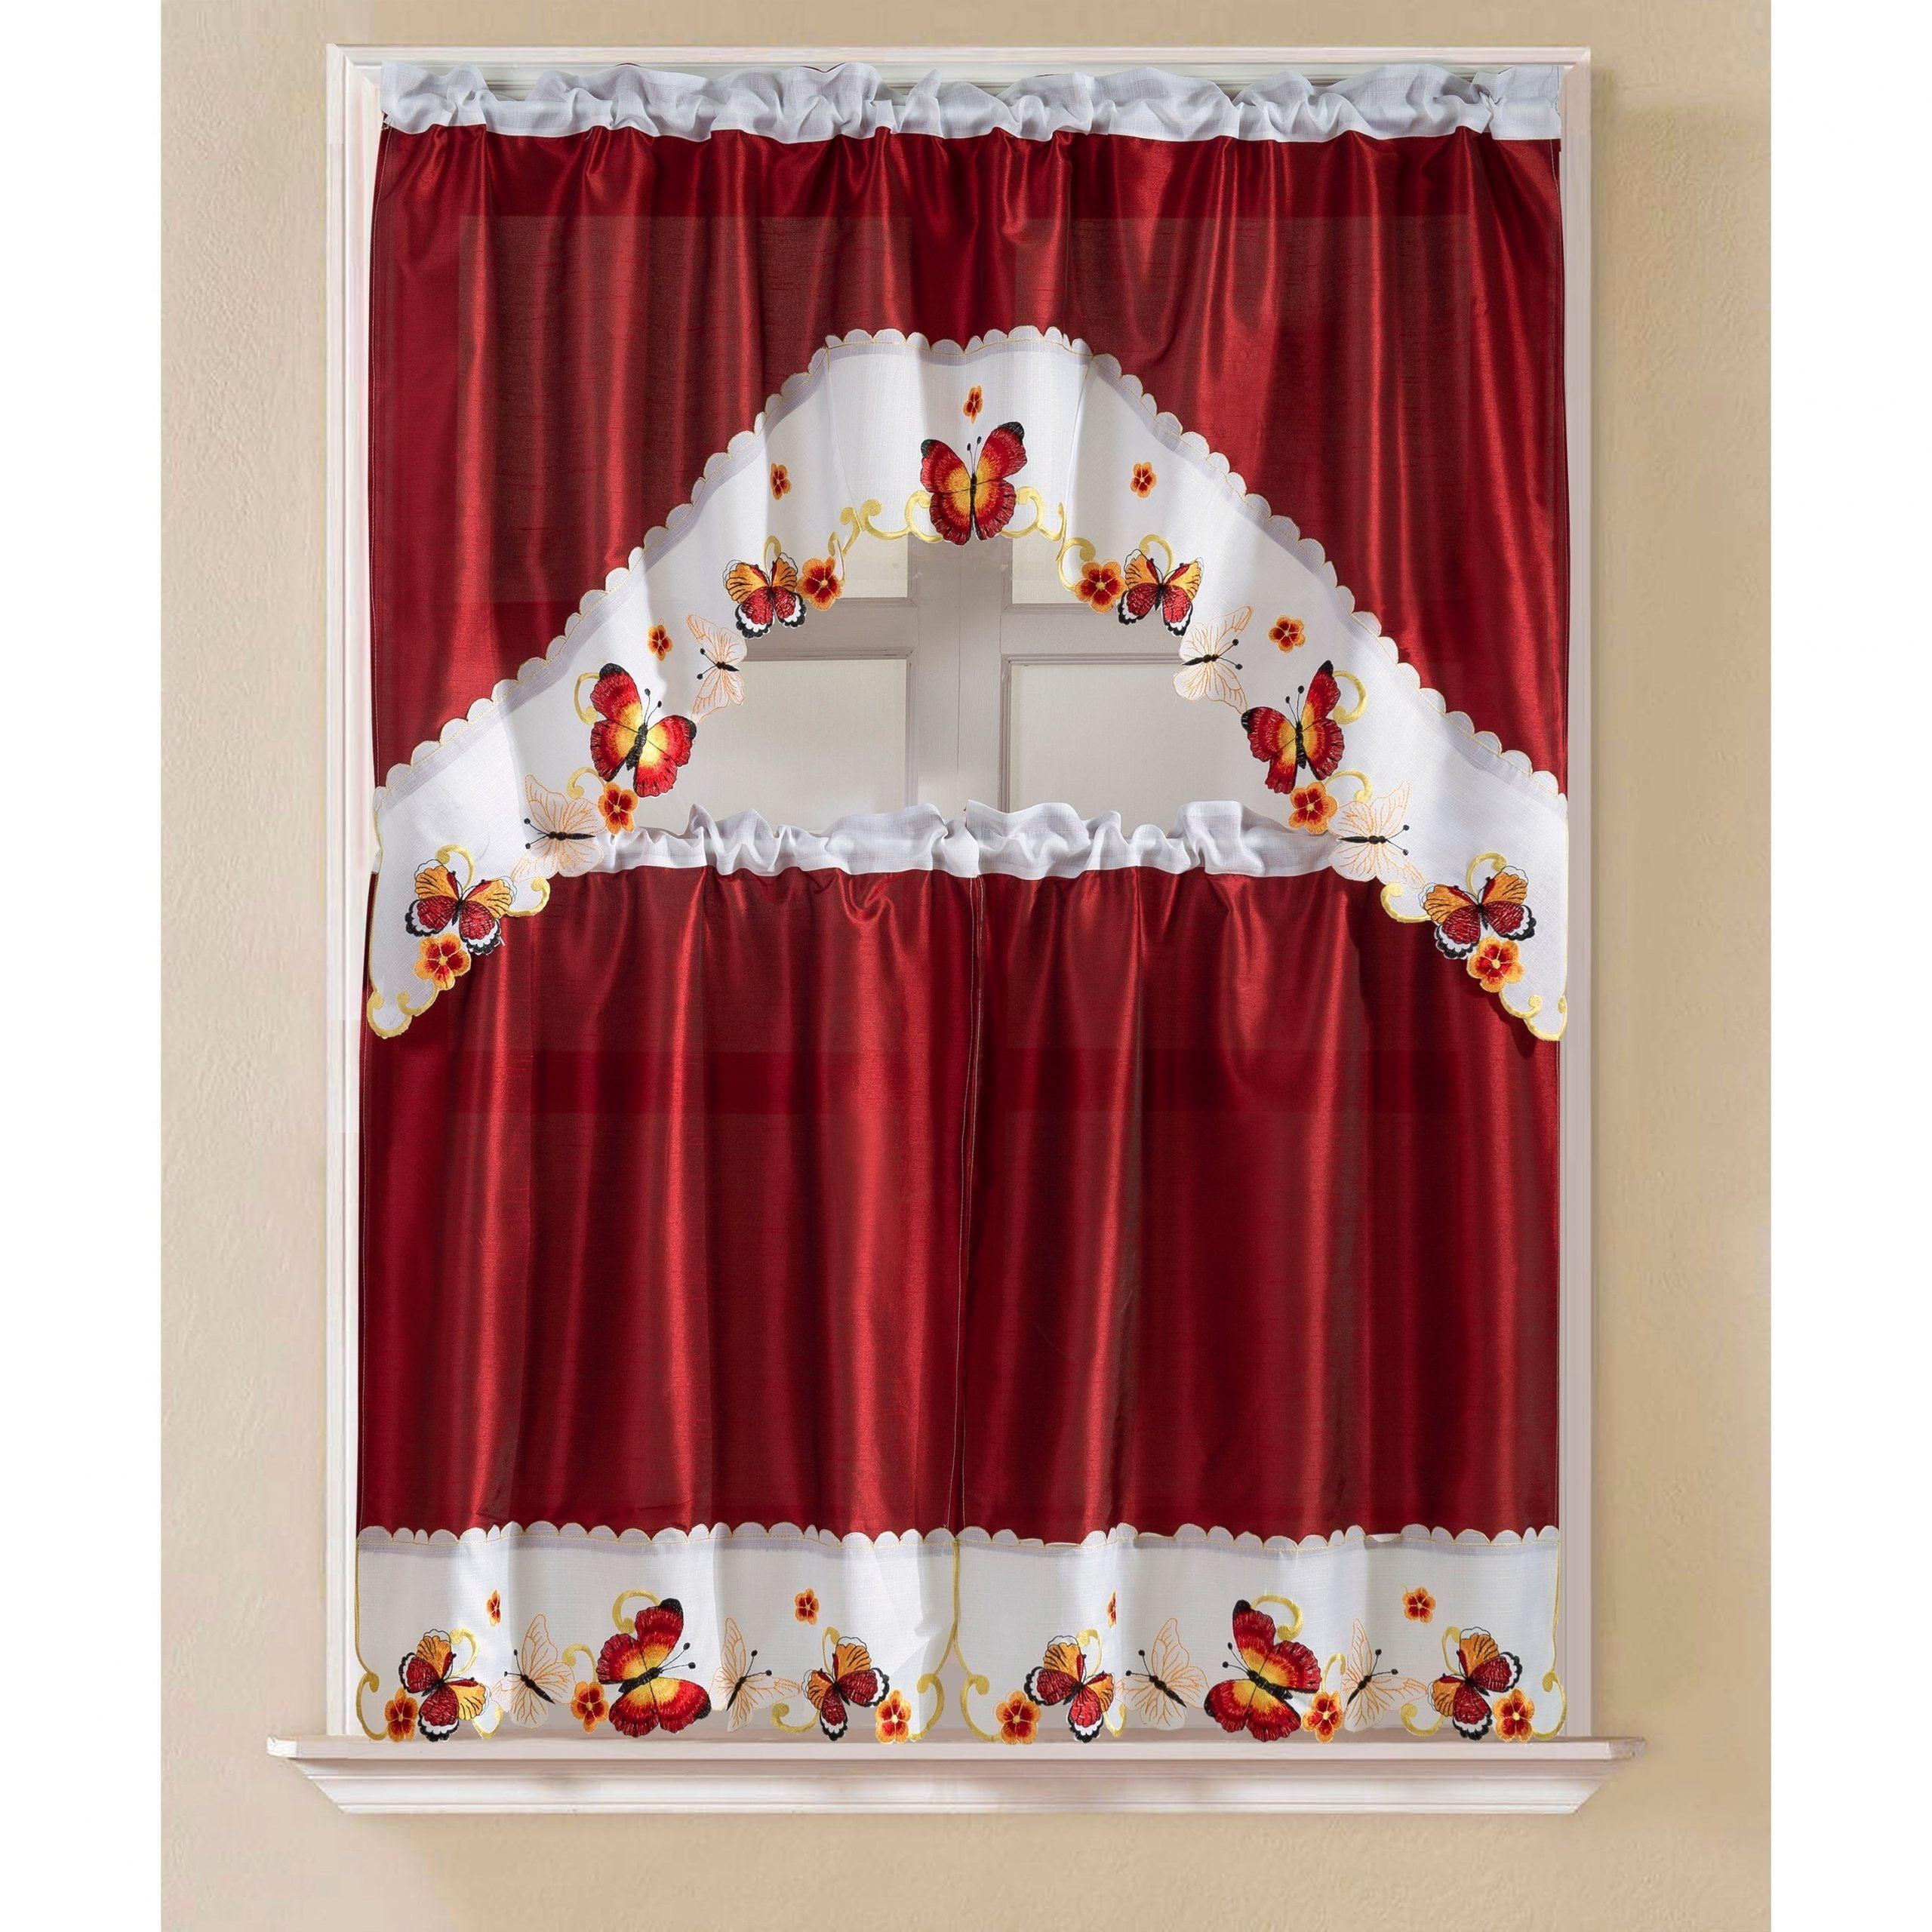 Famous Faux Silk 3 Piece Kitchen Curtain Sets Intended For Porch & Den Eastview Faux Silk 3 Piece Kitchen Curtain Set (View 2 of 20)